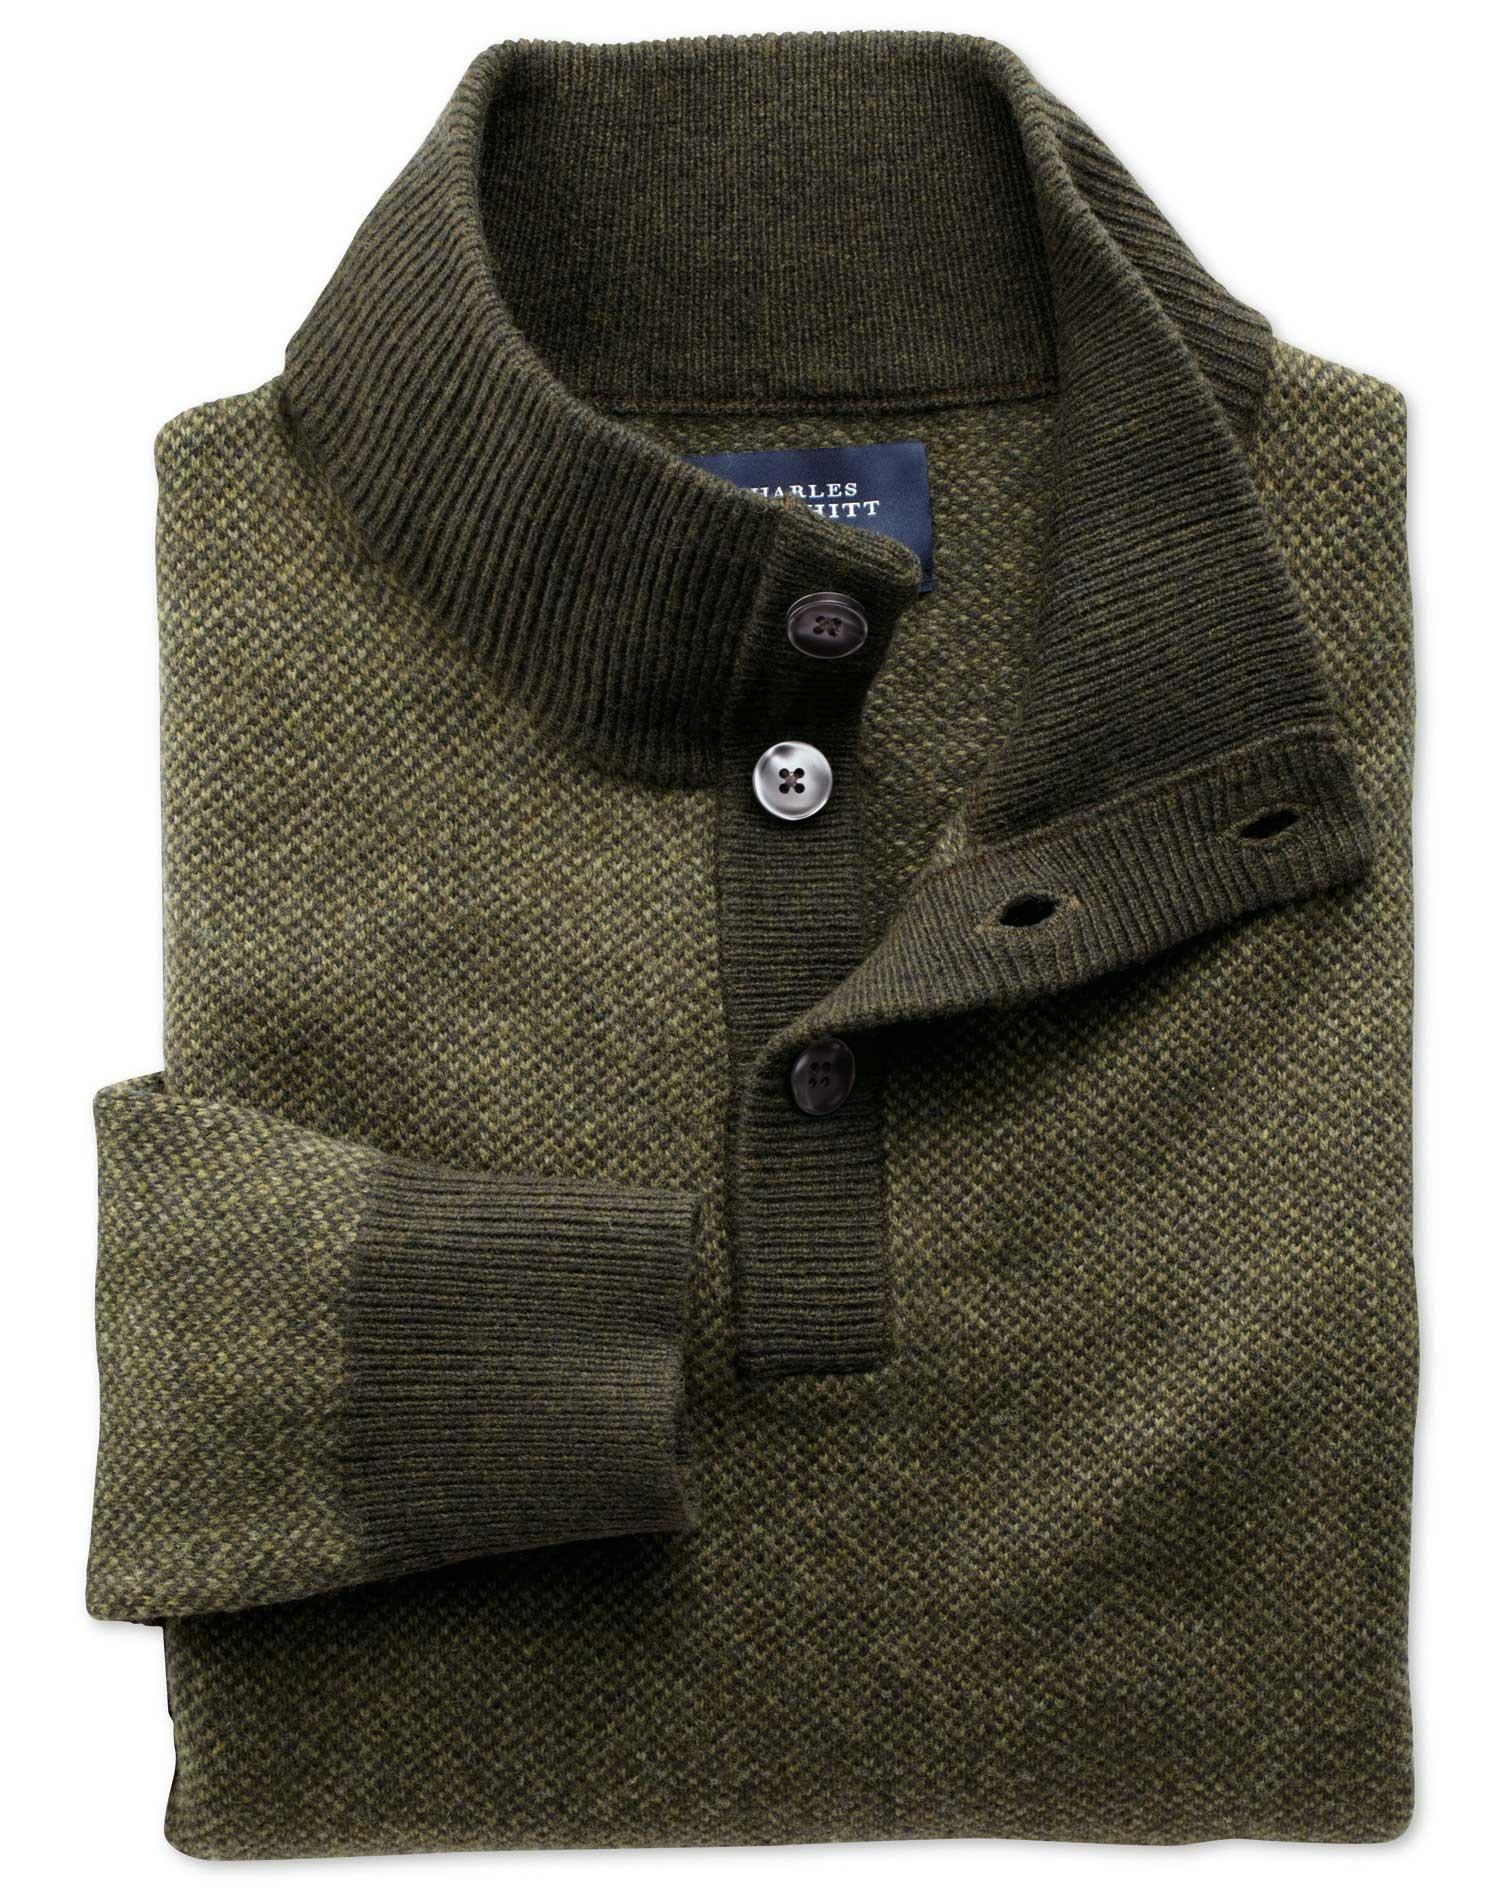 Khaki Jacquard Button Neck Wool Jumper Size XL by Charles Tyrwhitt